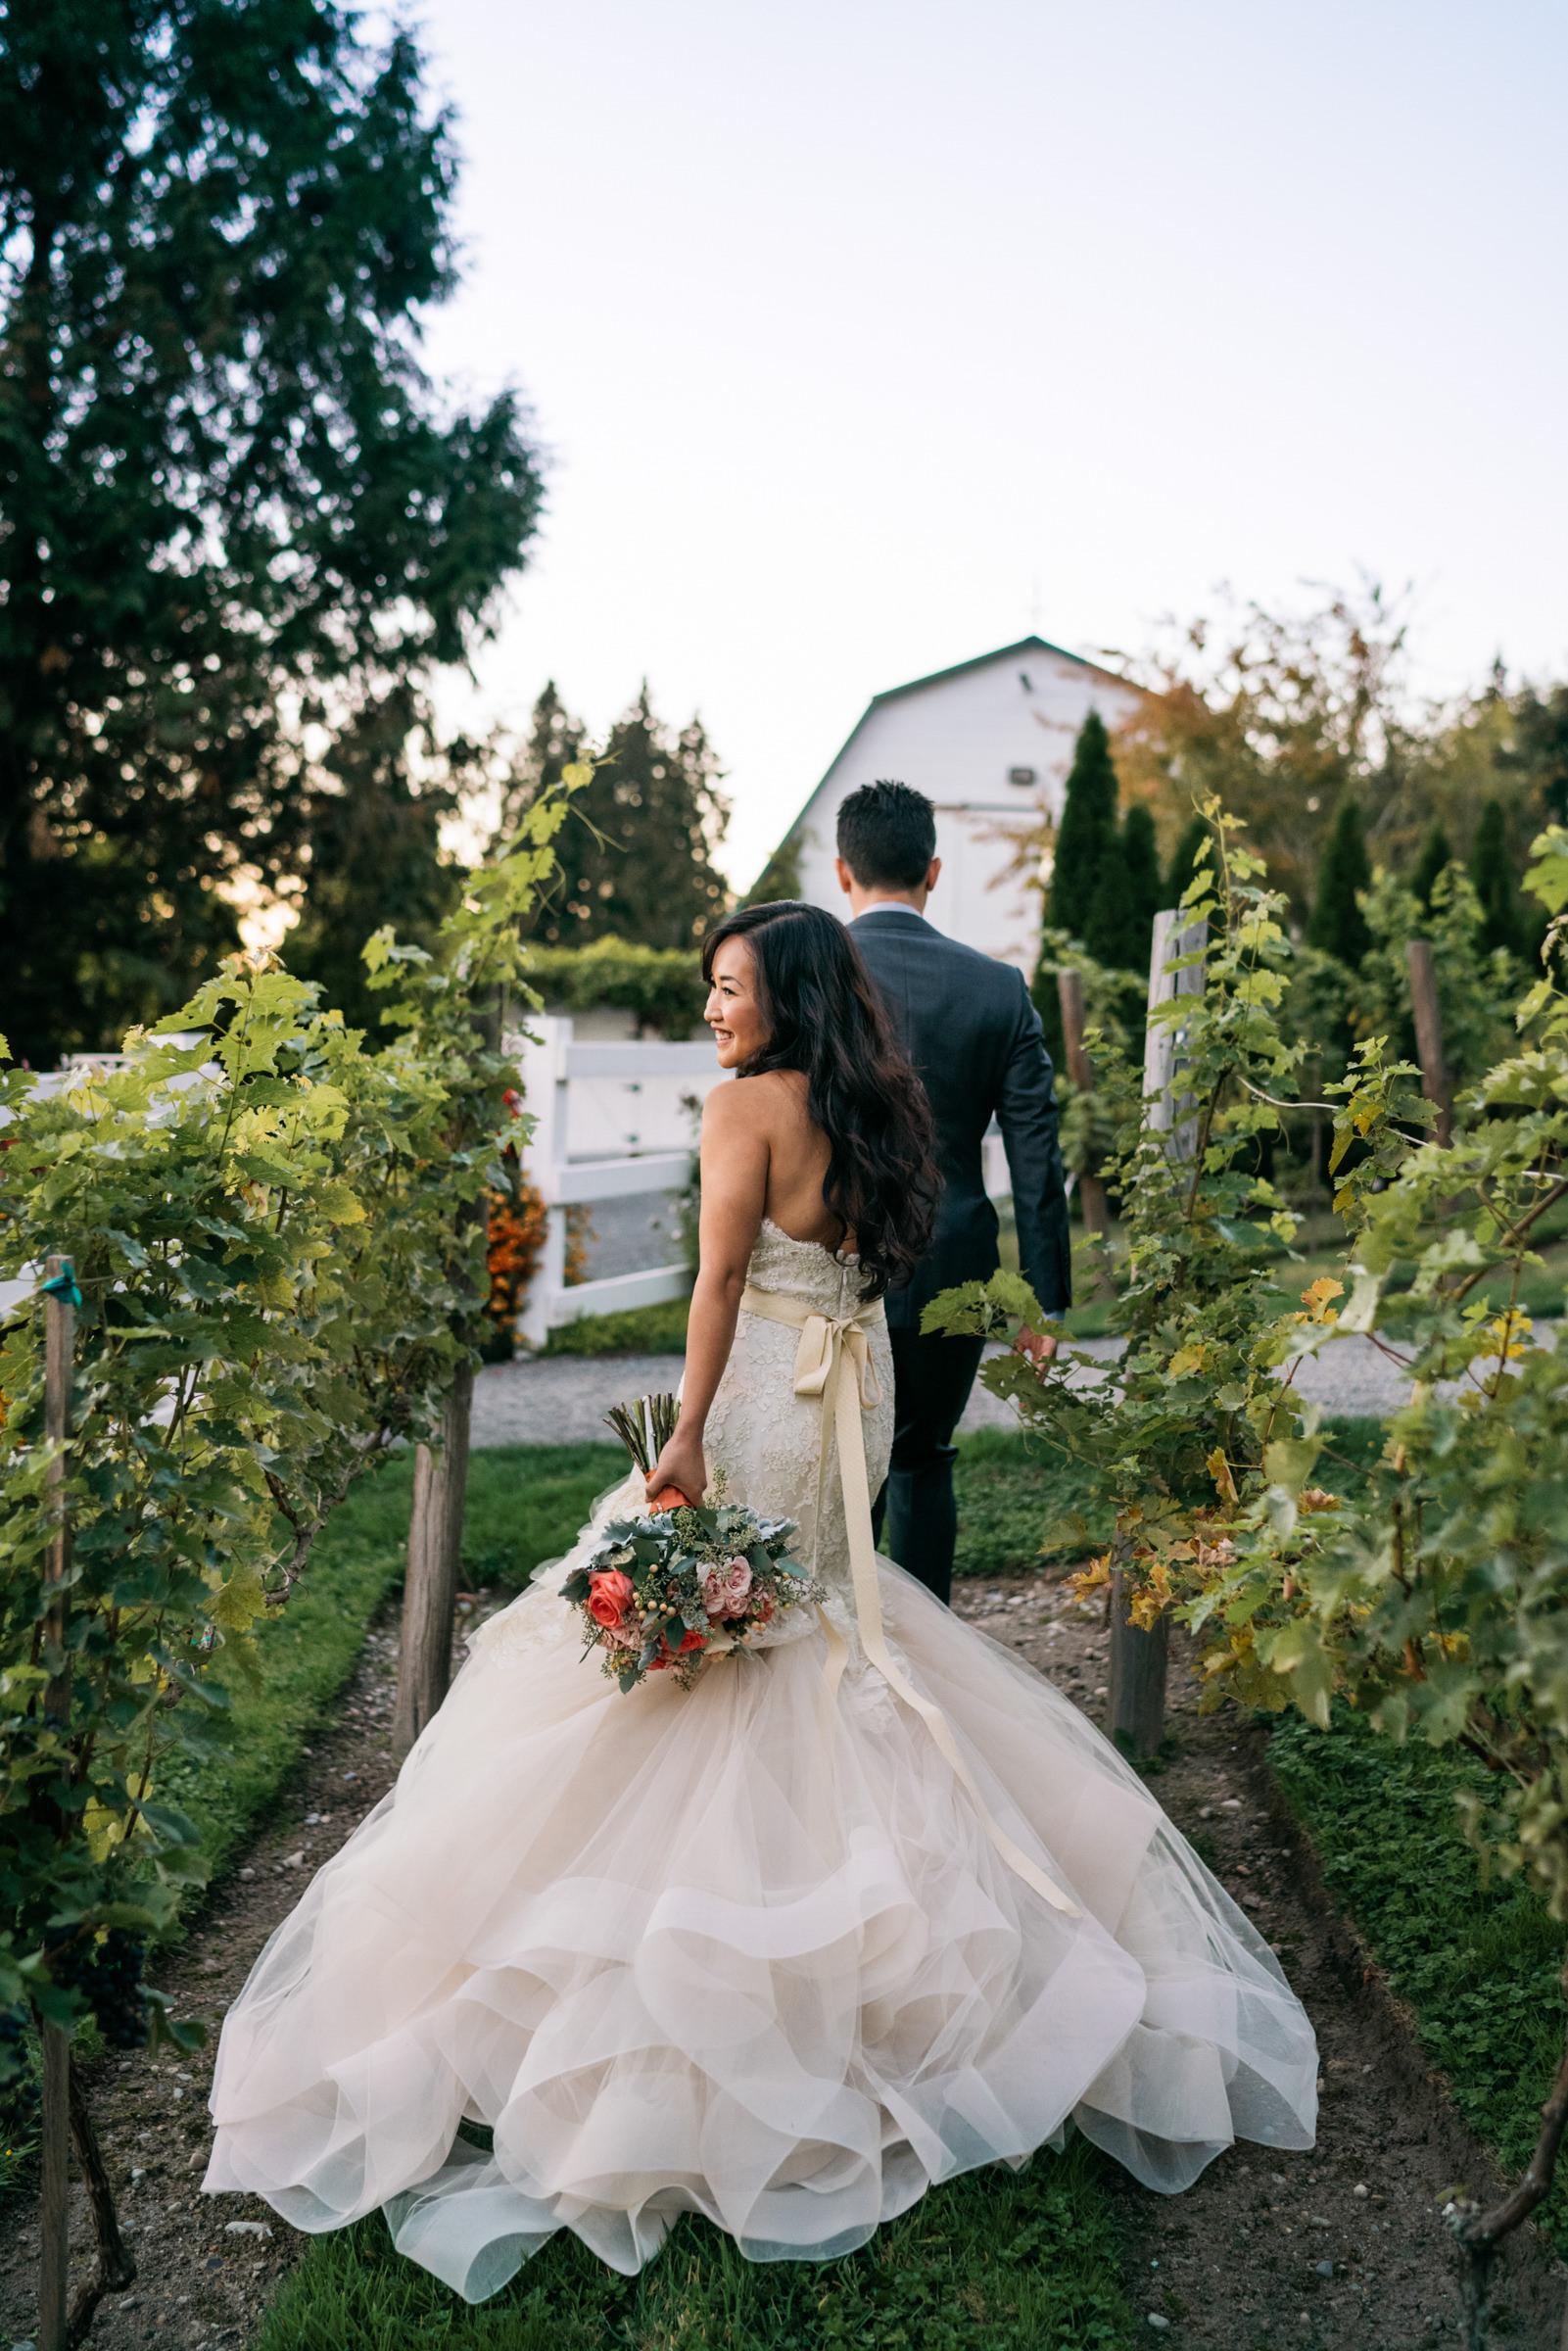 elegant-bride-with-groom-walk-in-grape-arbor-sasha-reiko-photography